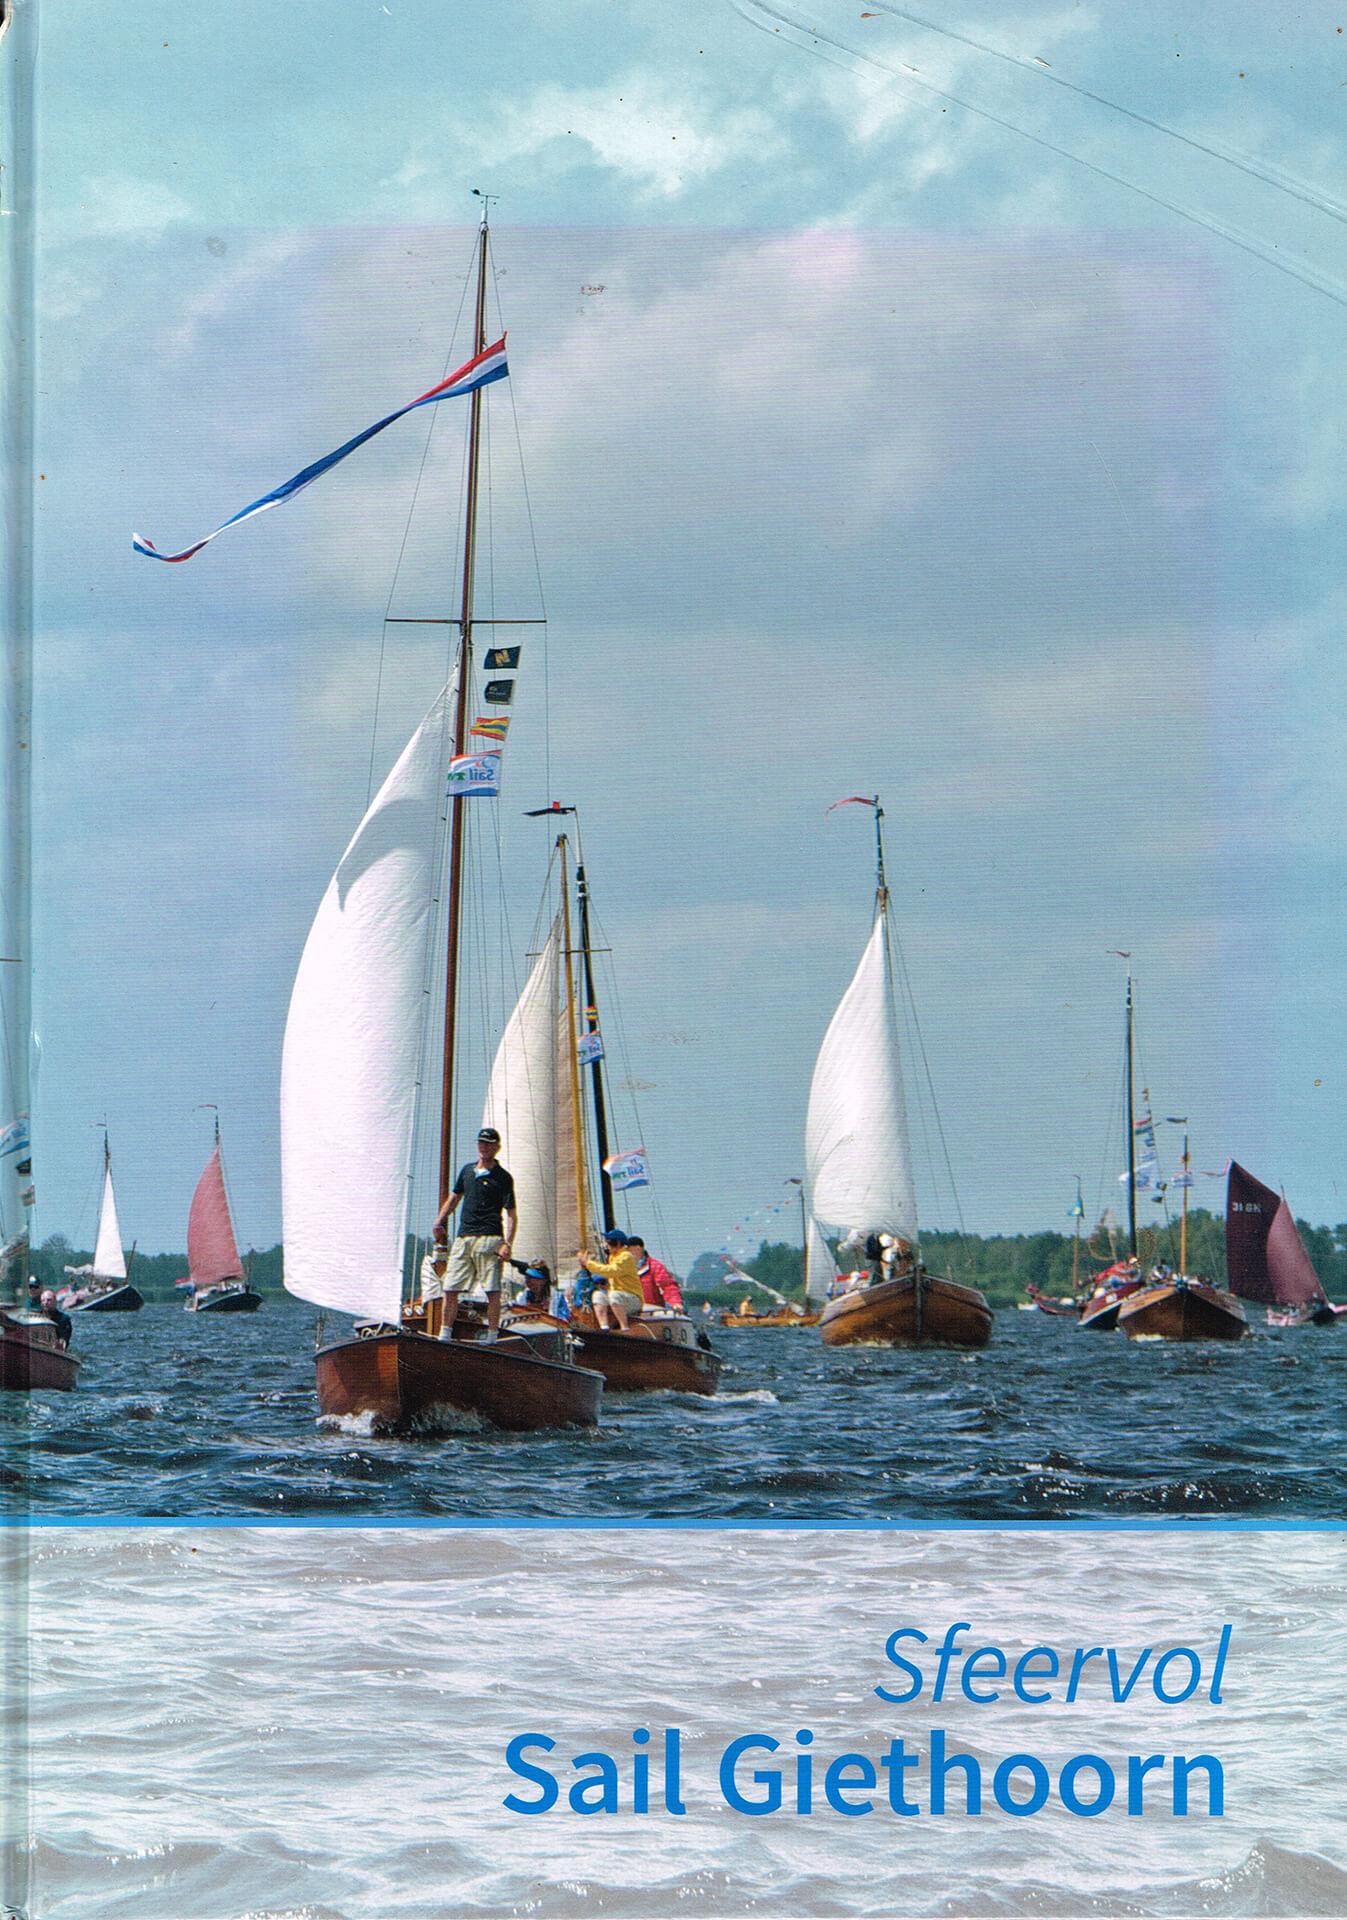 Sail Giethoorn